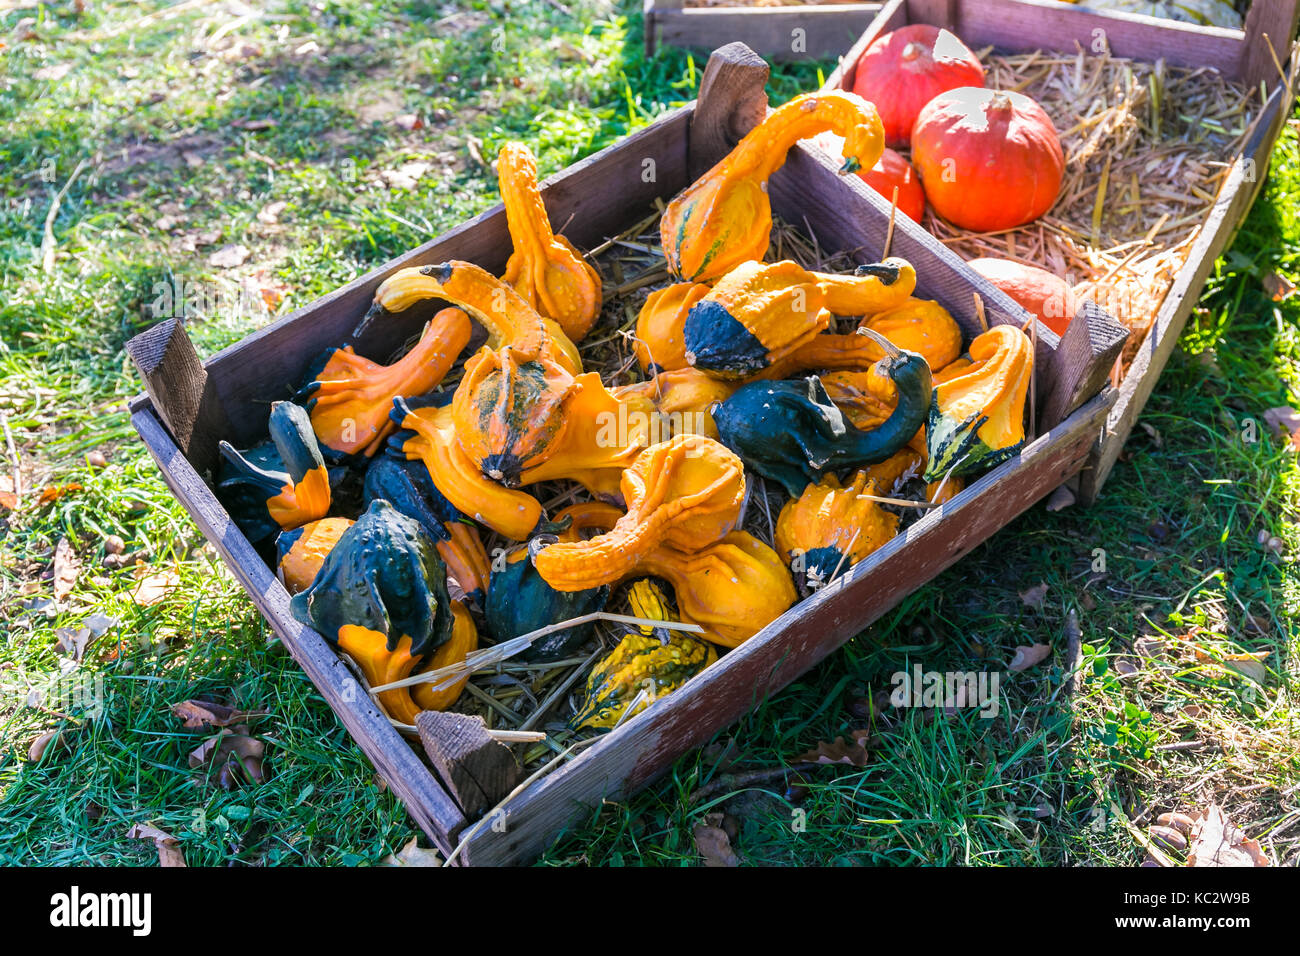 MERODE, GERMANY - SEPTEMBER 23, 2017 - Pumpkins for sale on a farm market. - Stock Image